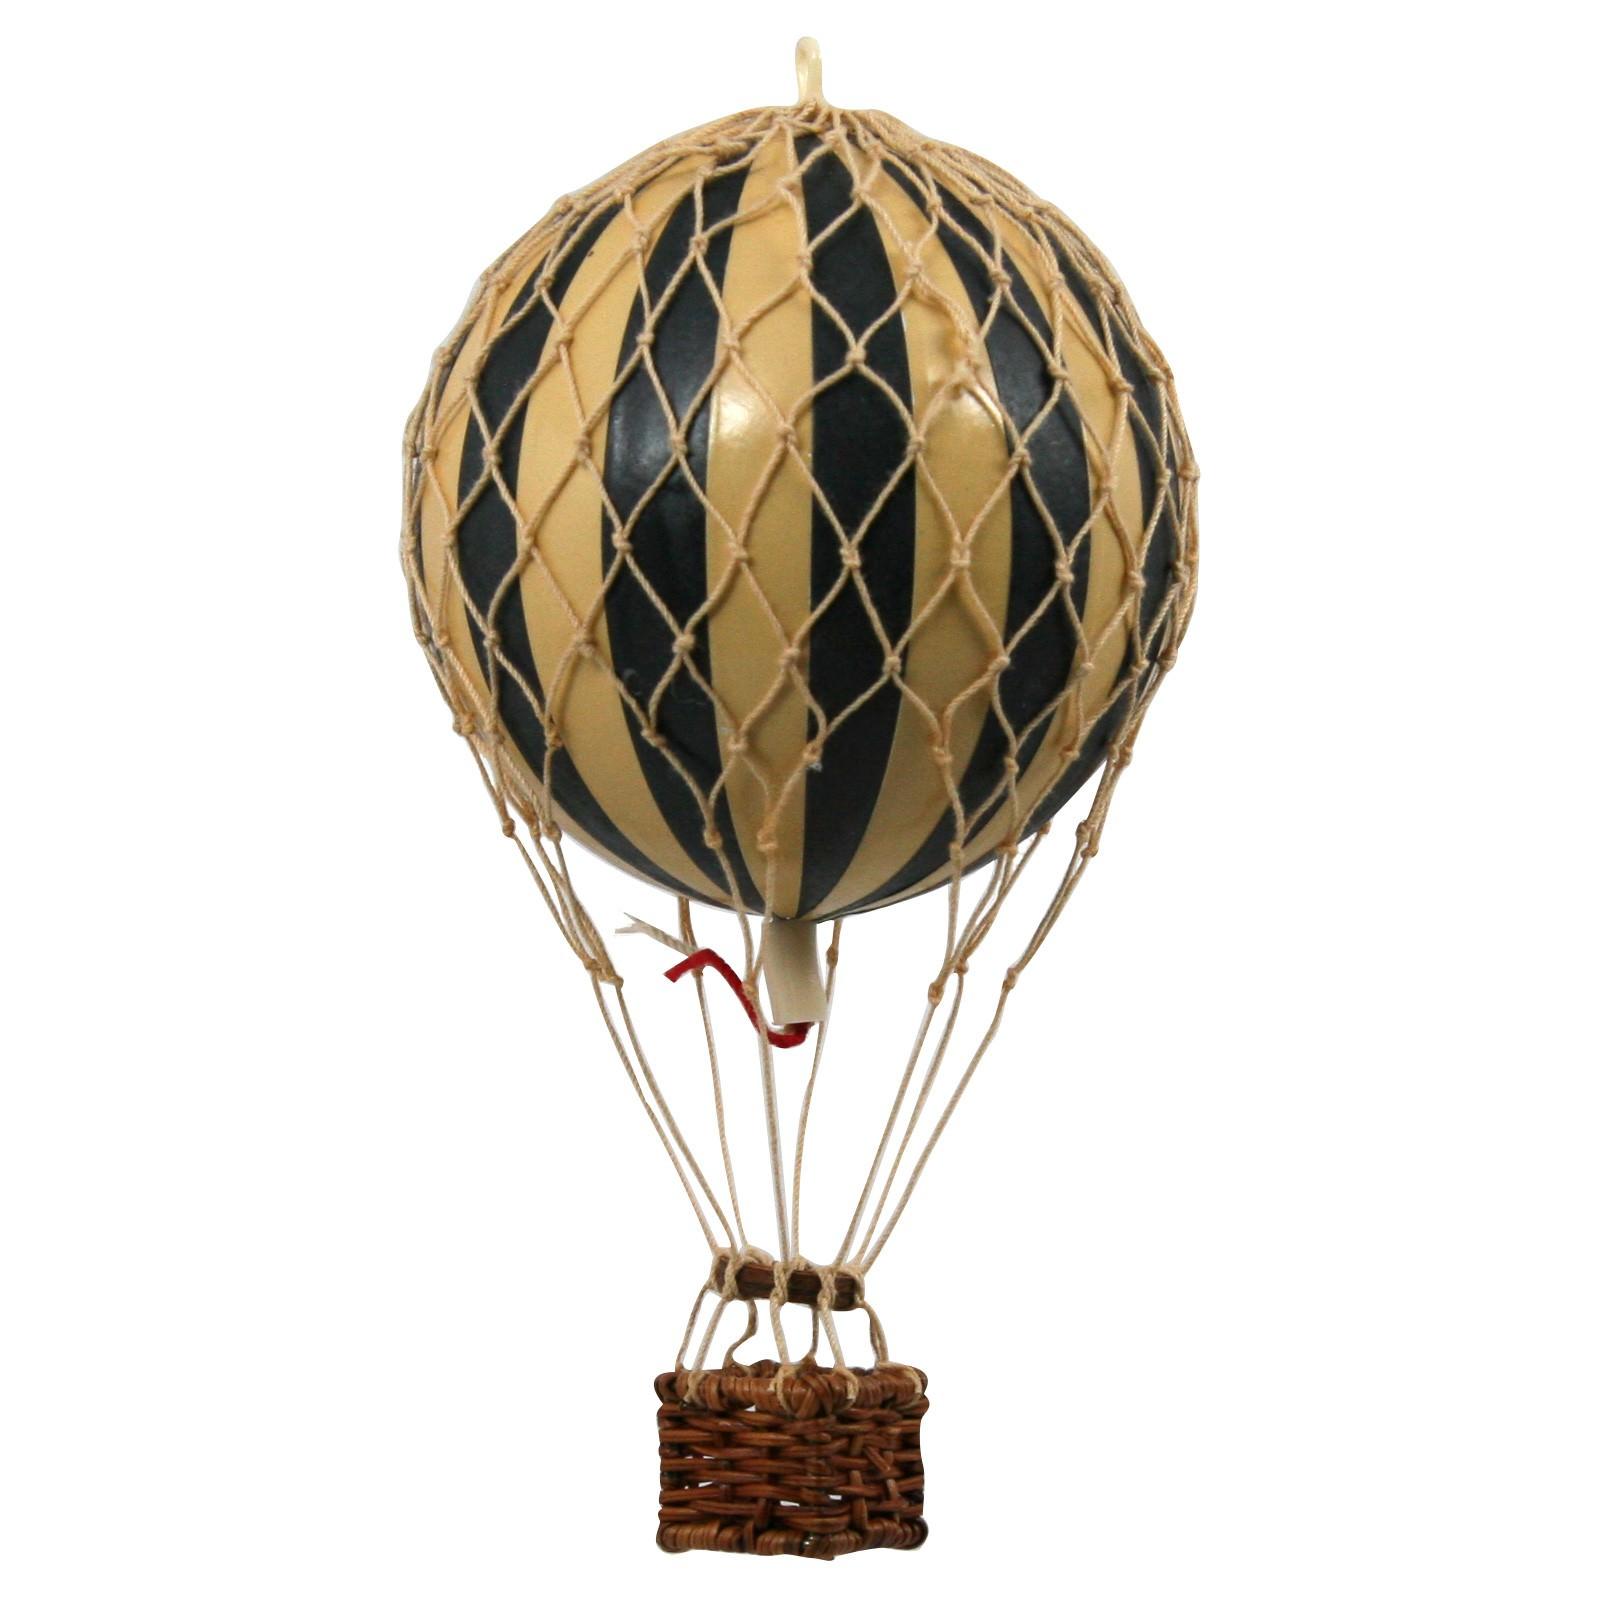 Floating The Skies Hot Air Balloon Model, Black